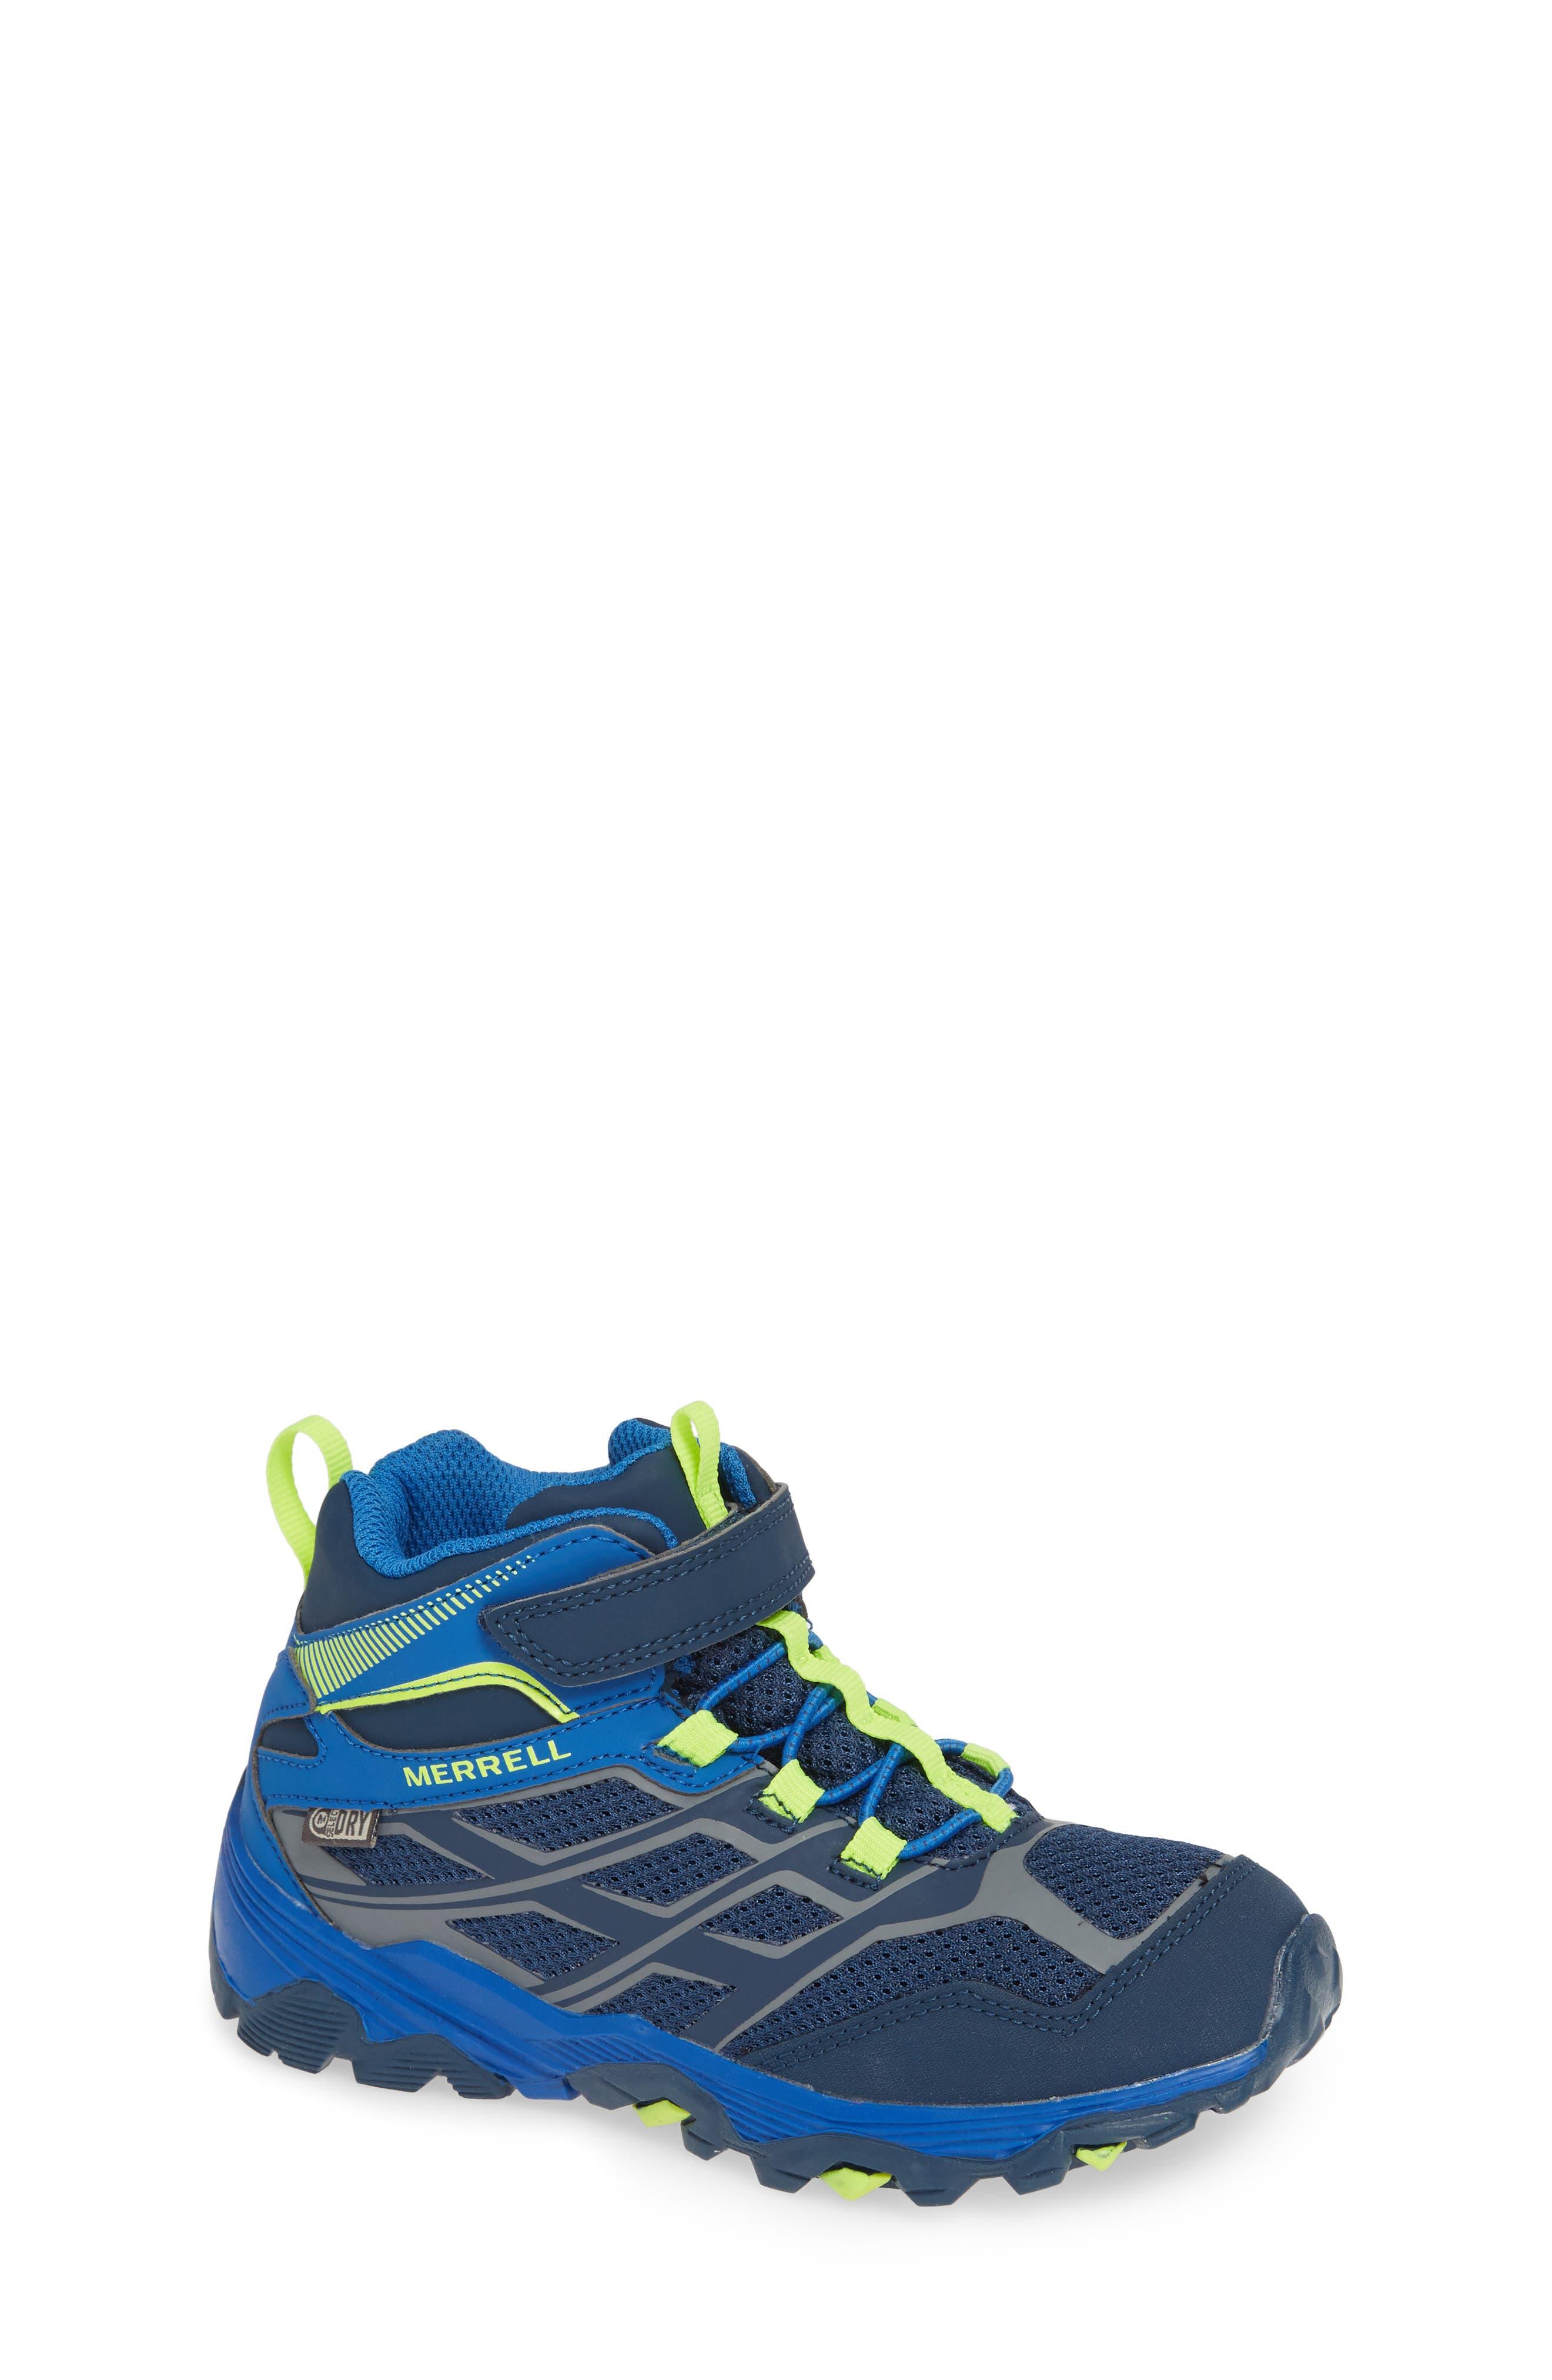 MERRELL, Moab FST Mid Top Waterproof Sneaker Boot, Main thumbnail 1, color, NAVY/ COBALT